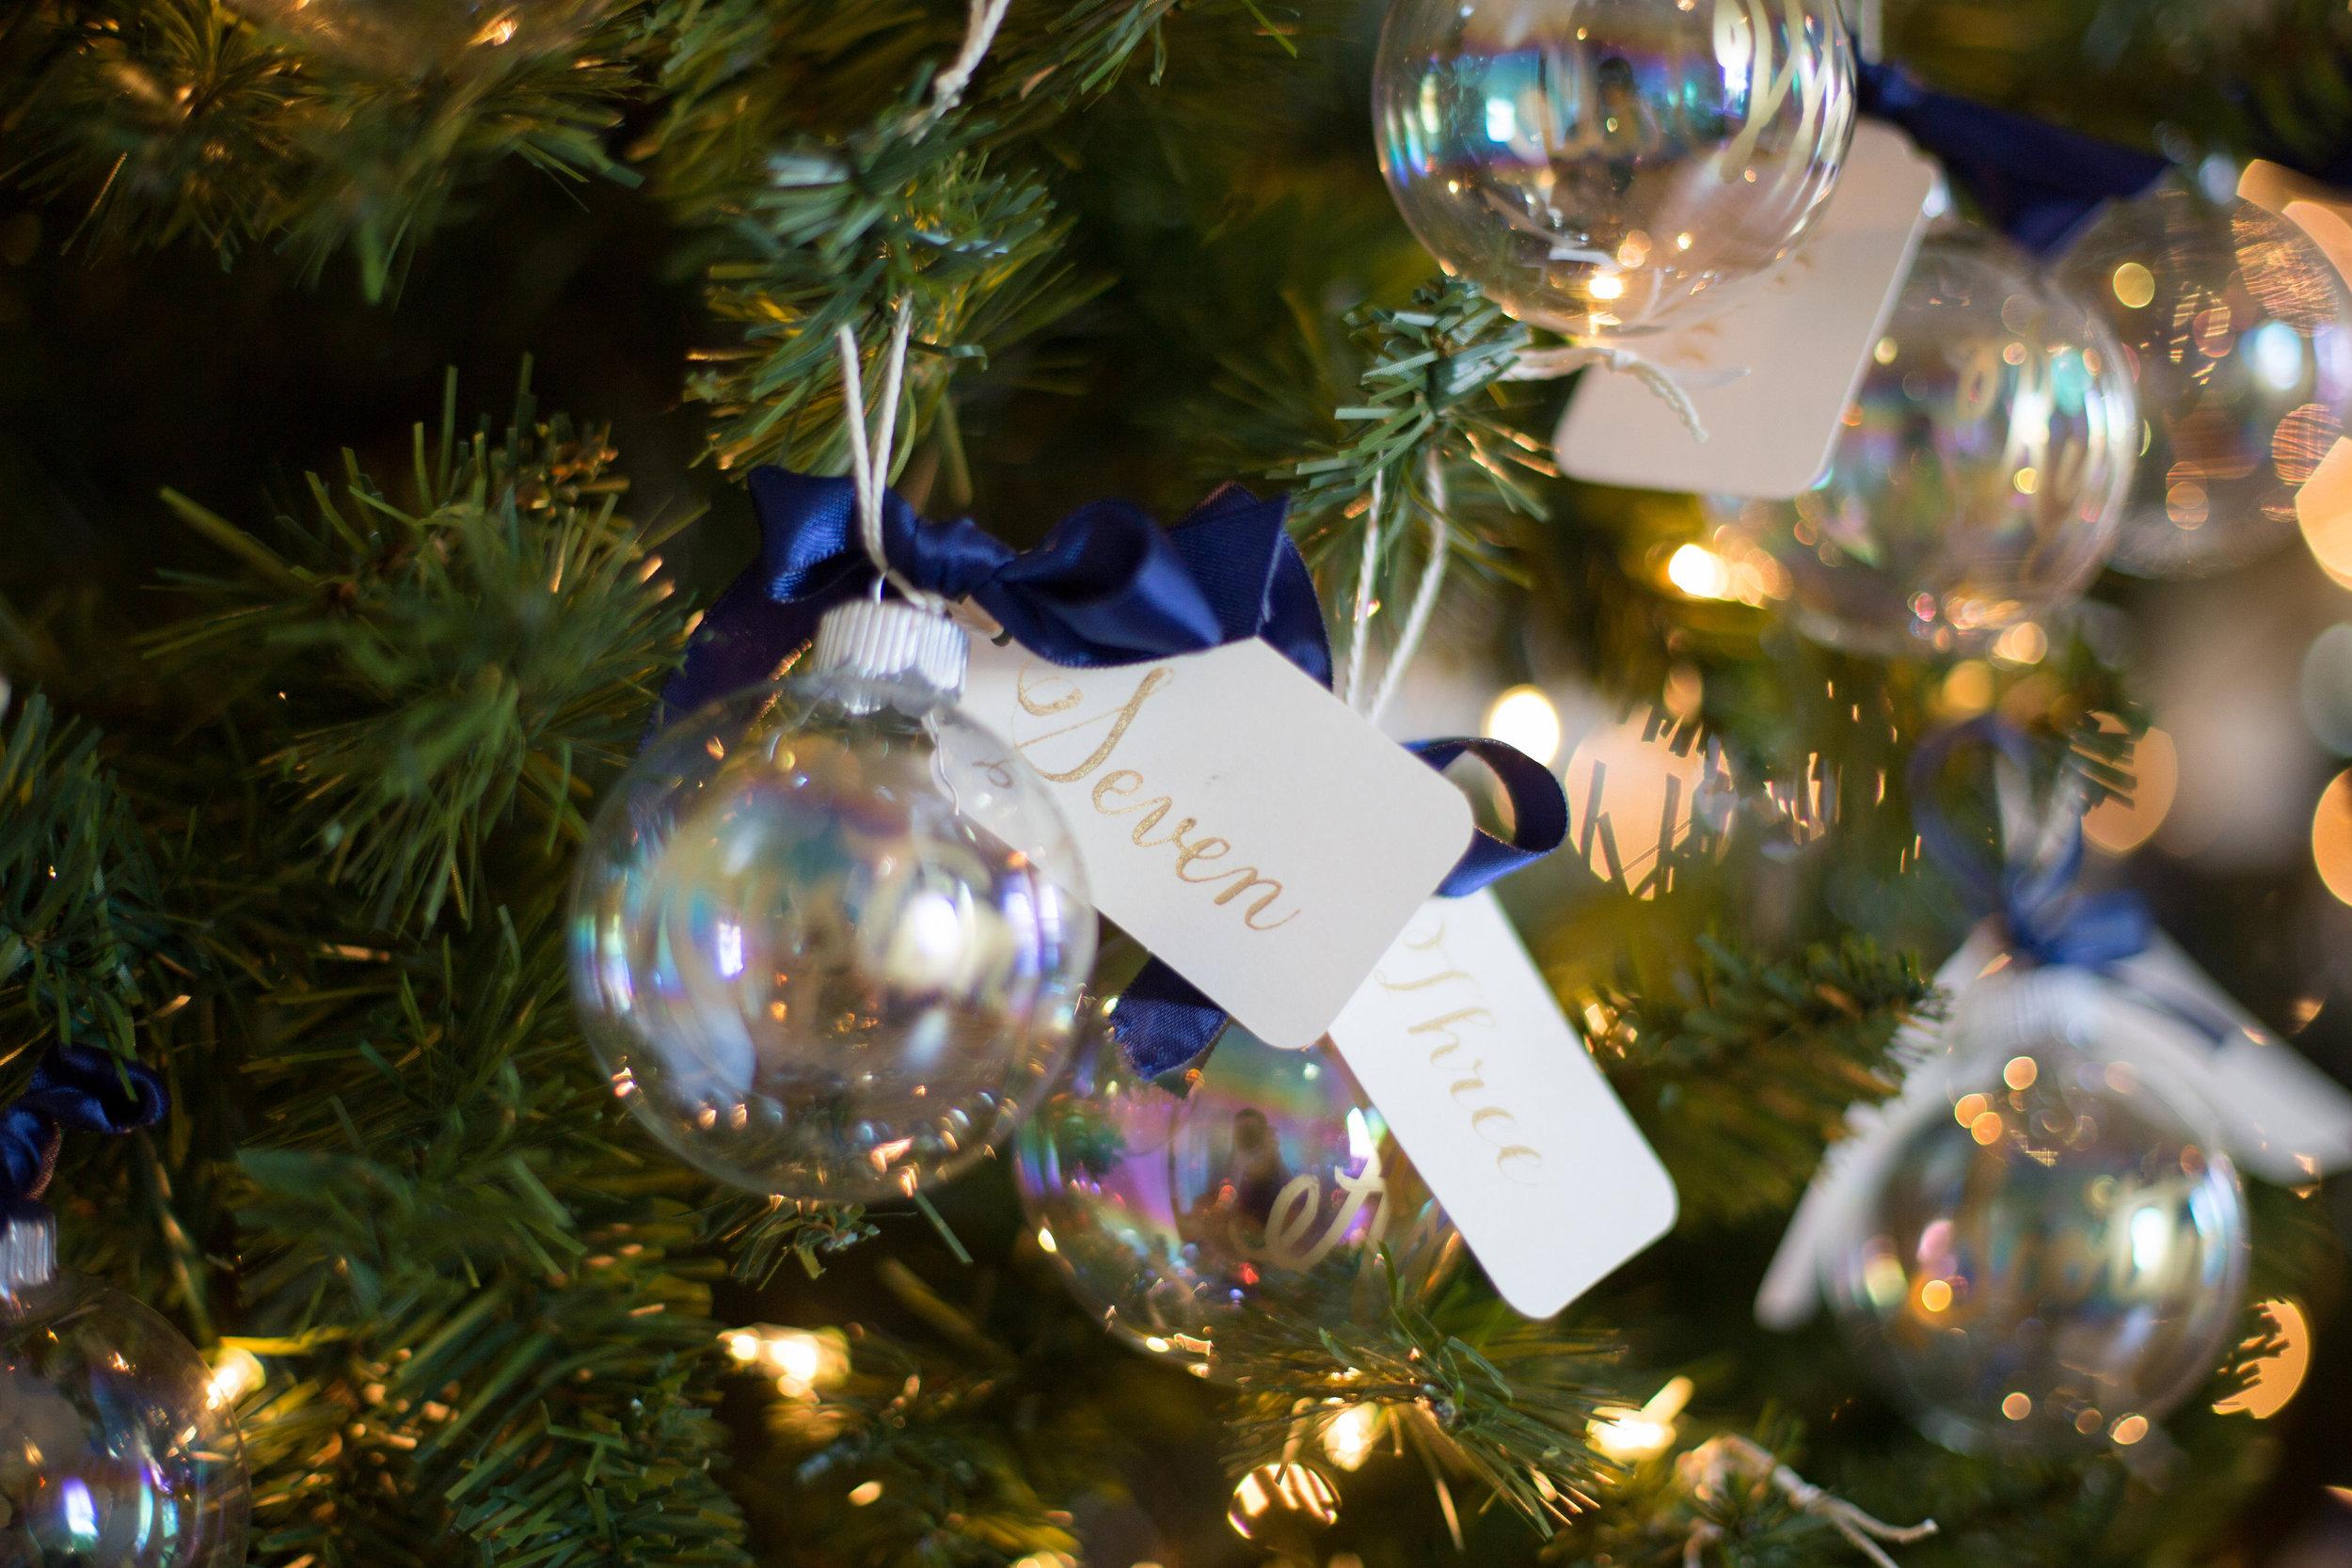 034c3-christmastreeornamentescortsraleighwinterweddingchristmastreeornamentescortsraleighwinterwedding.jpg